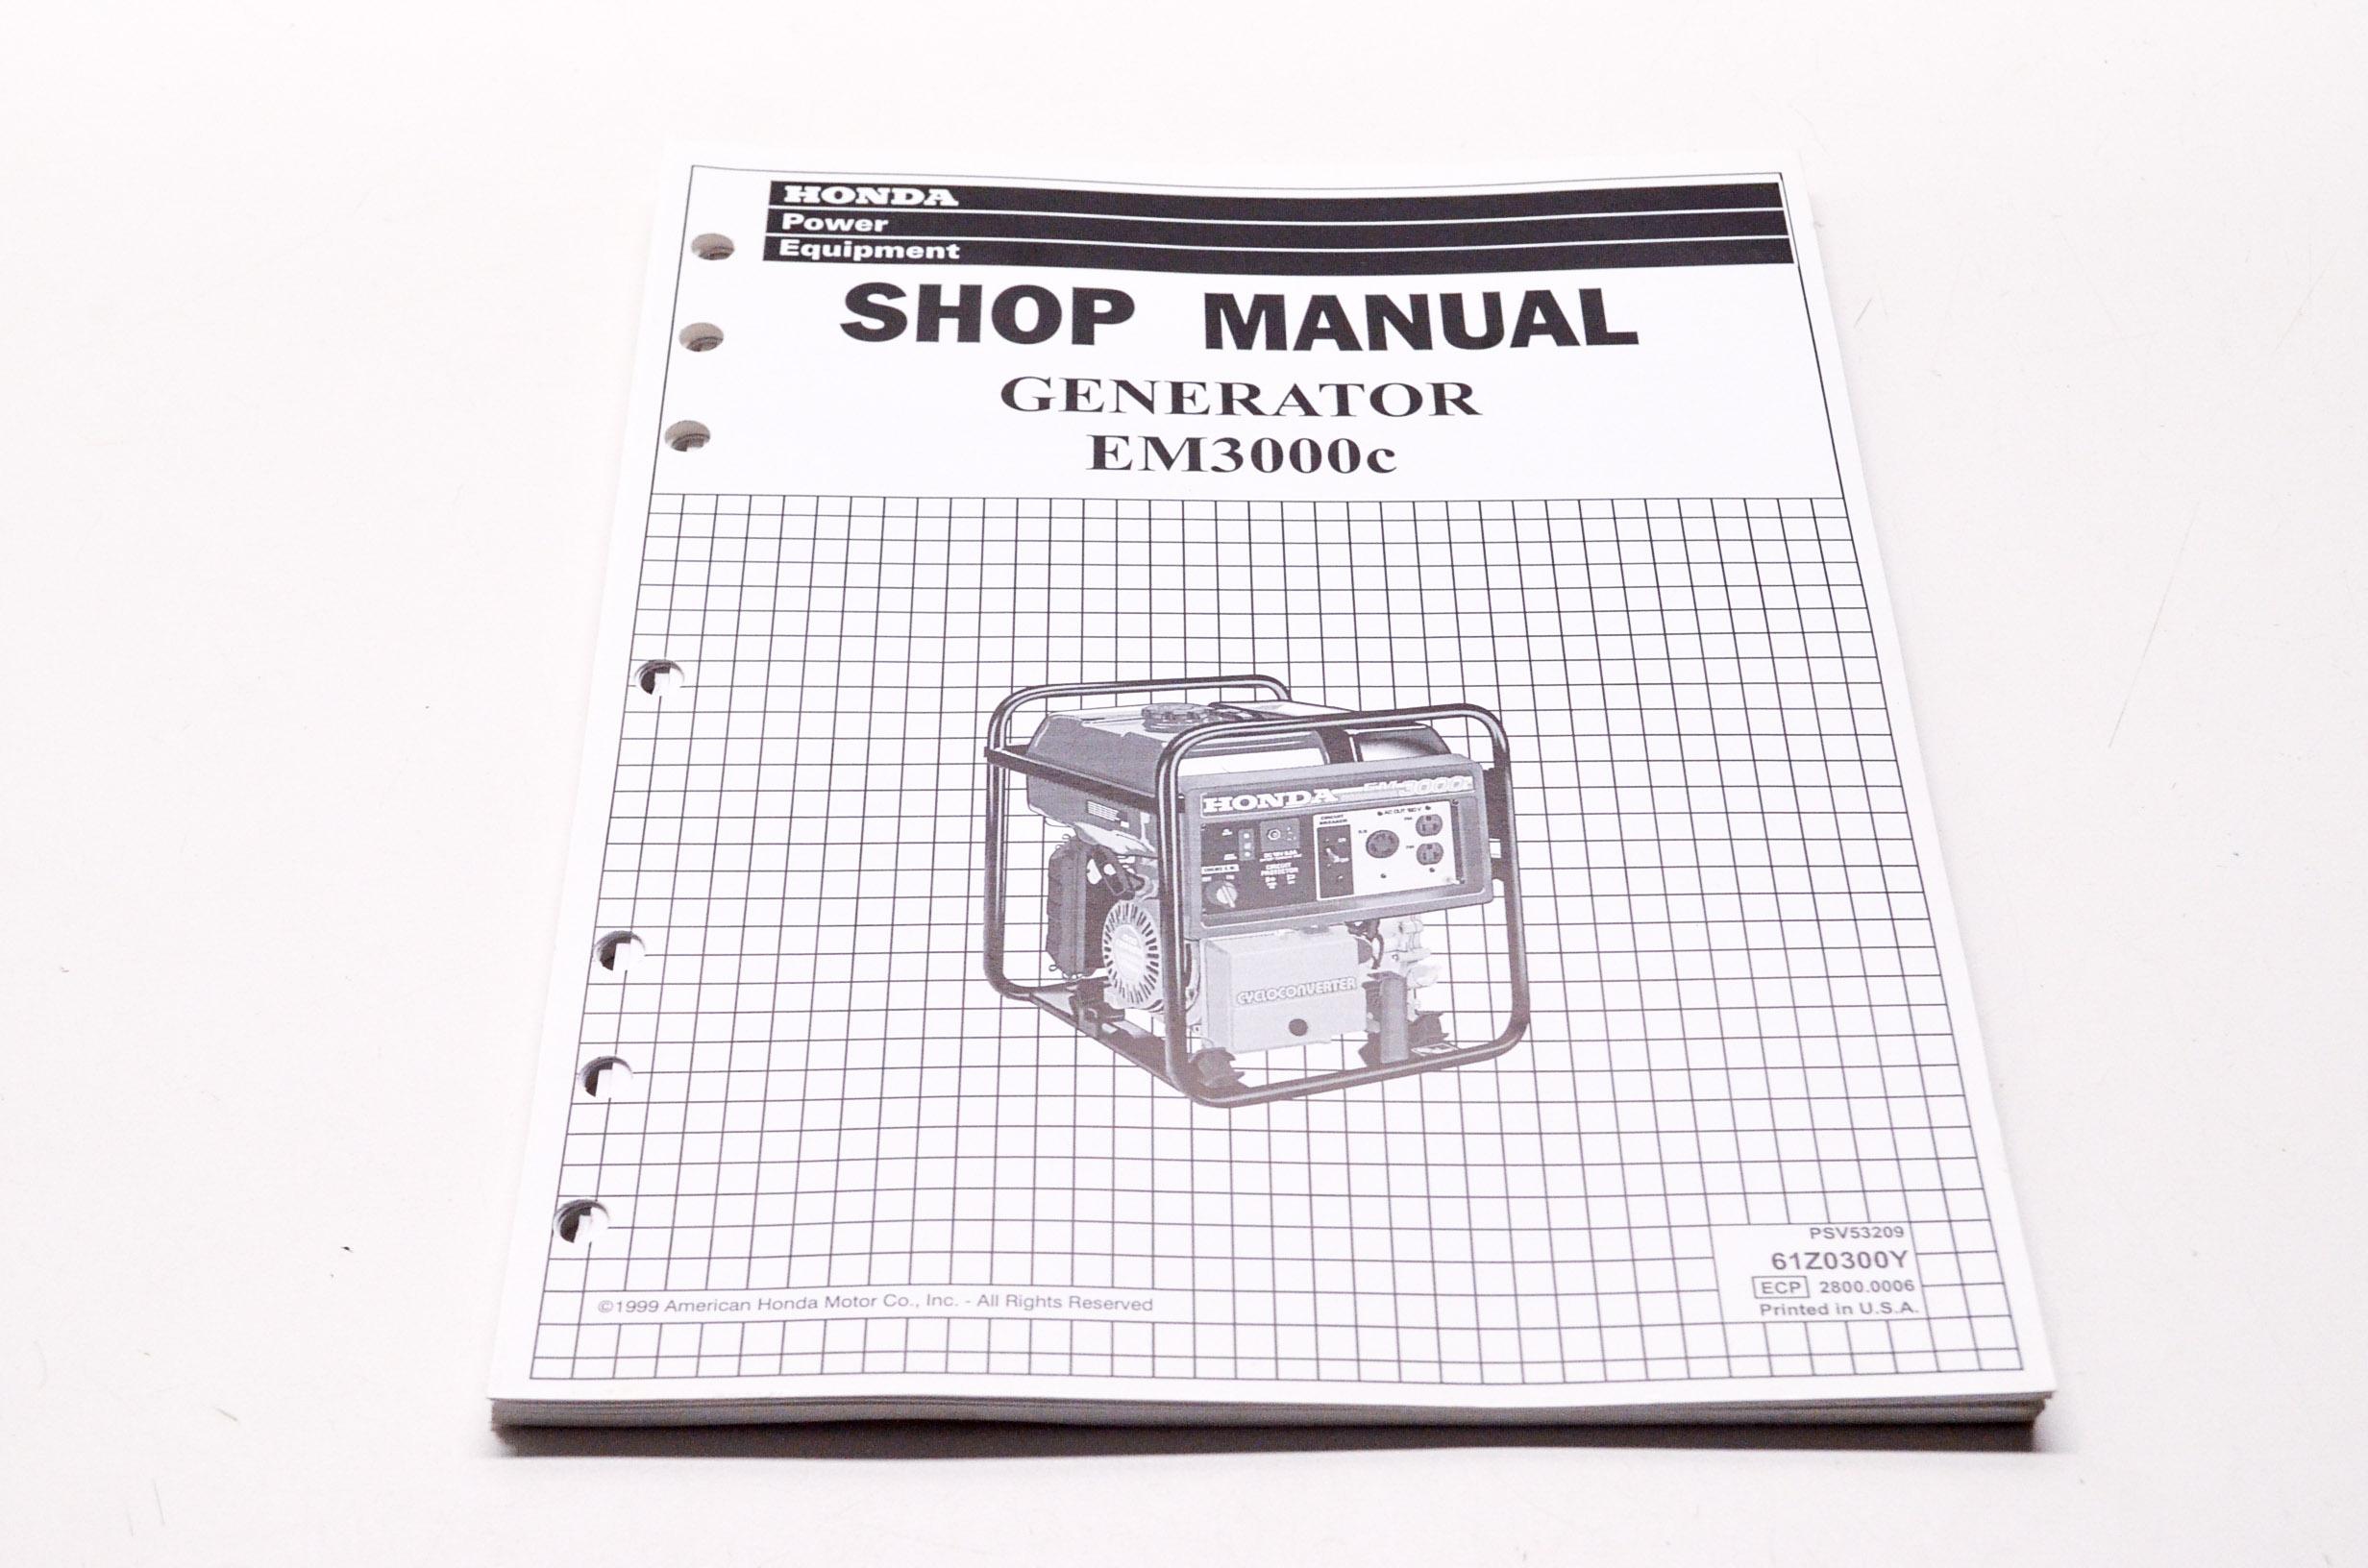 Honda Power Equipment Service Shop Manual Generator